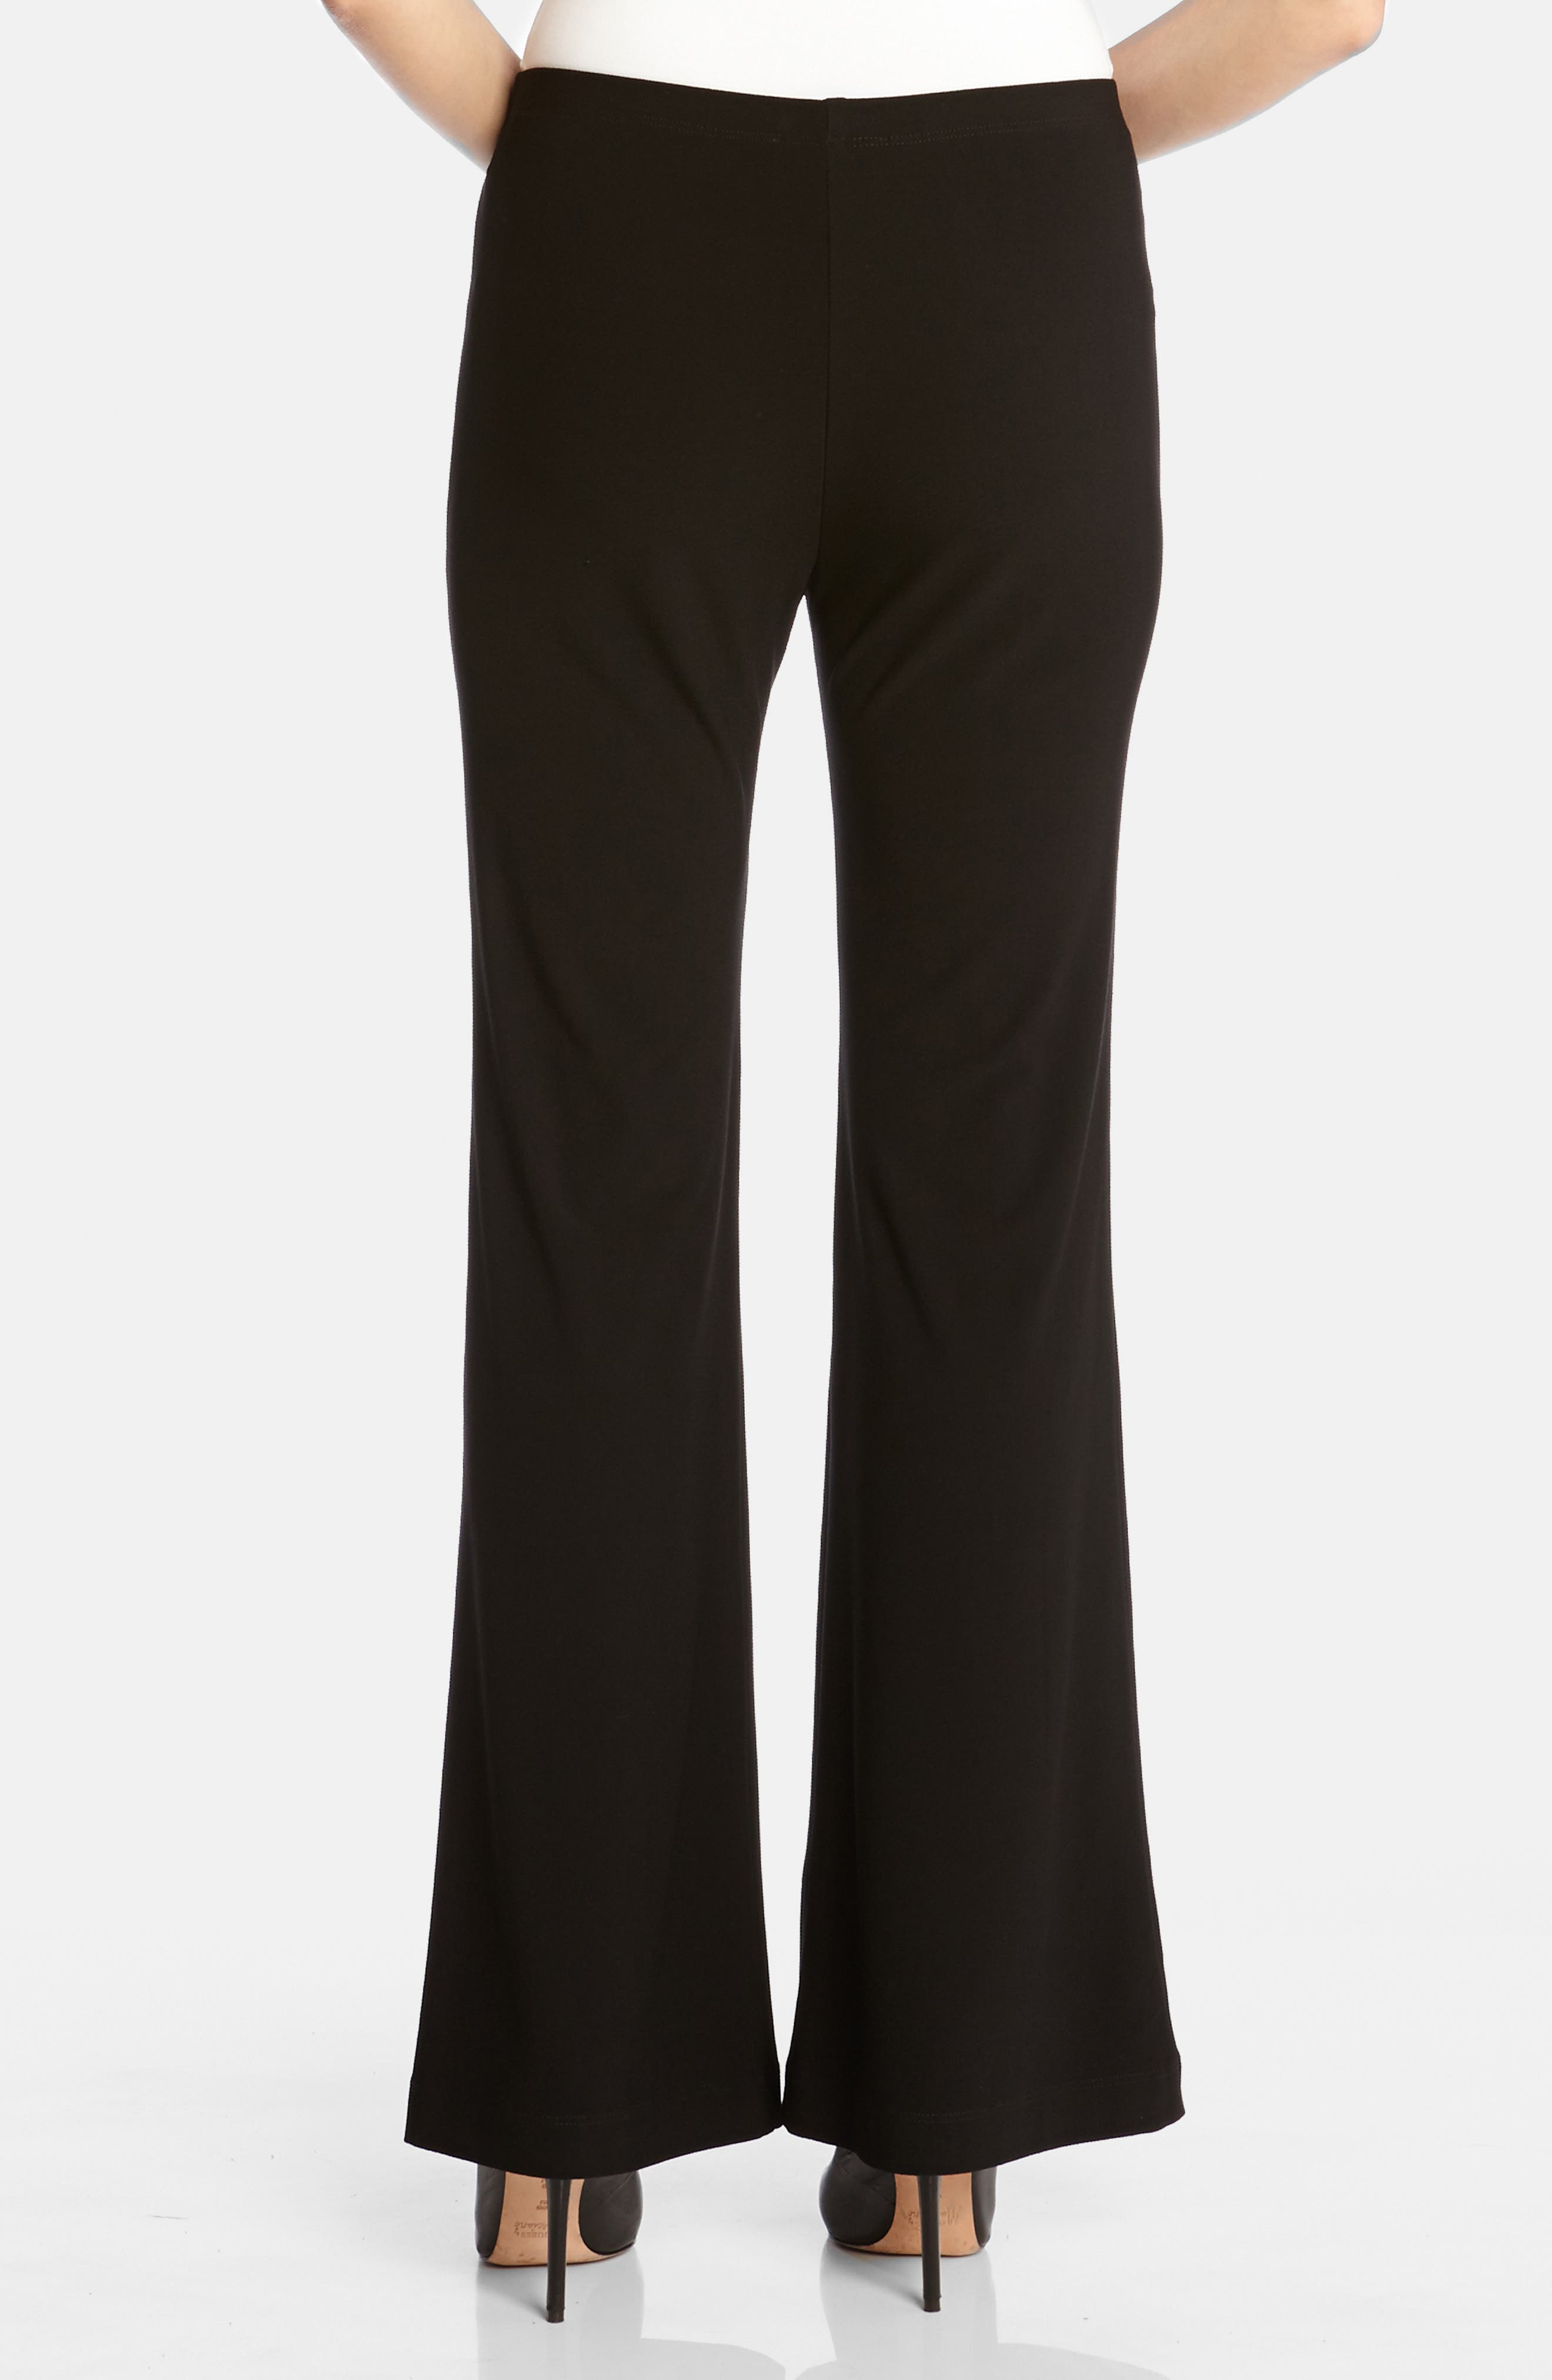 KAREN KANE, Wide Leg Crepe Pants, Alternate thumbnail 2, color, BLACK